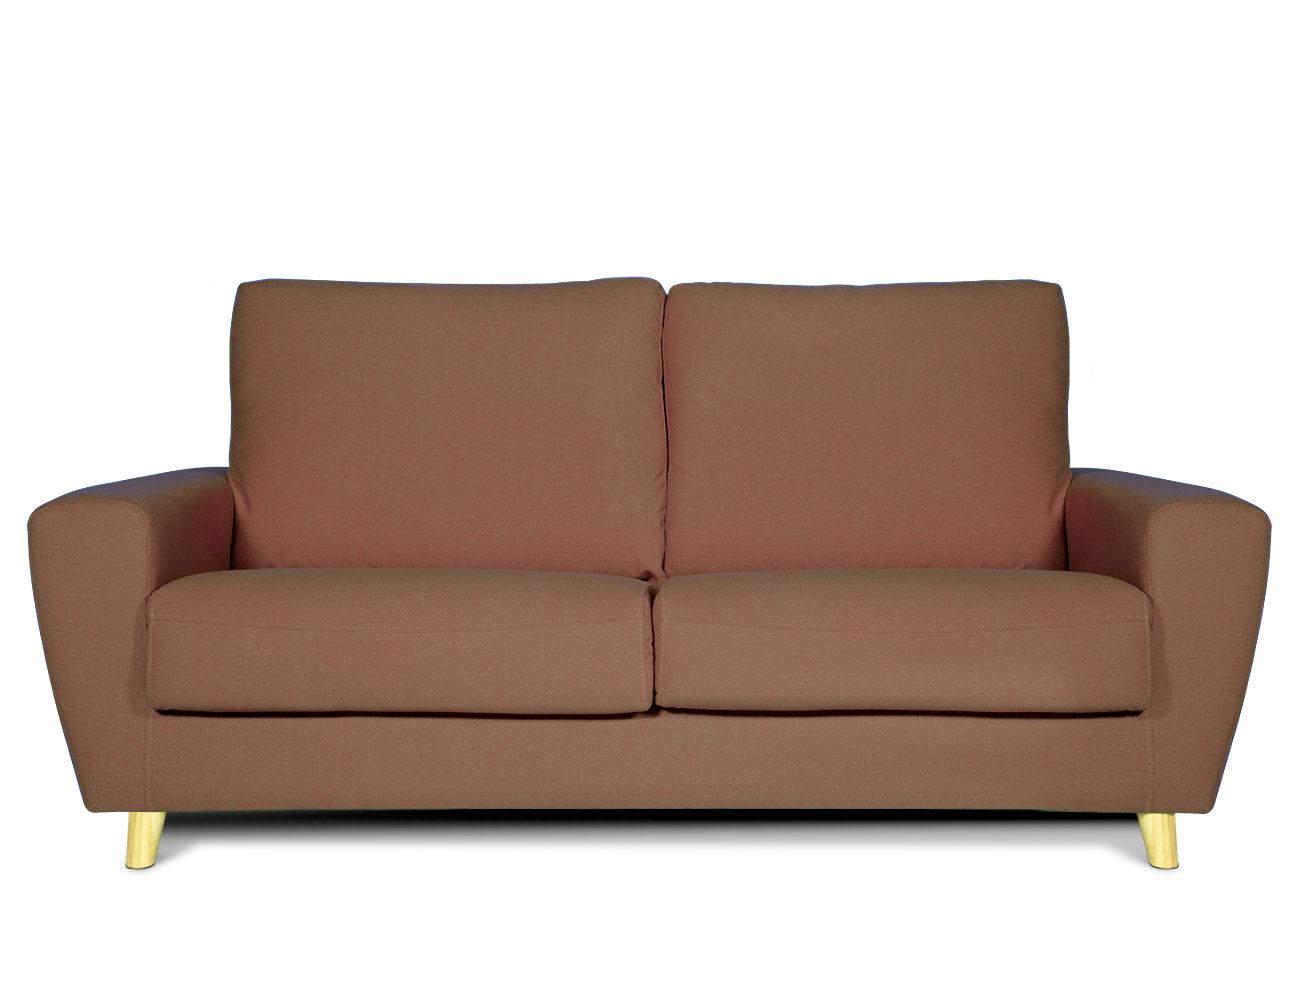 Sofa 3 plazas moderno chocolate